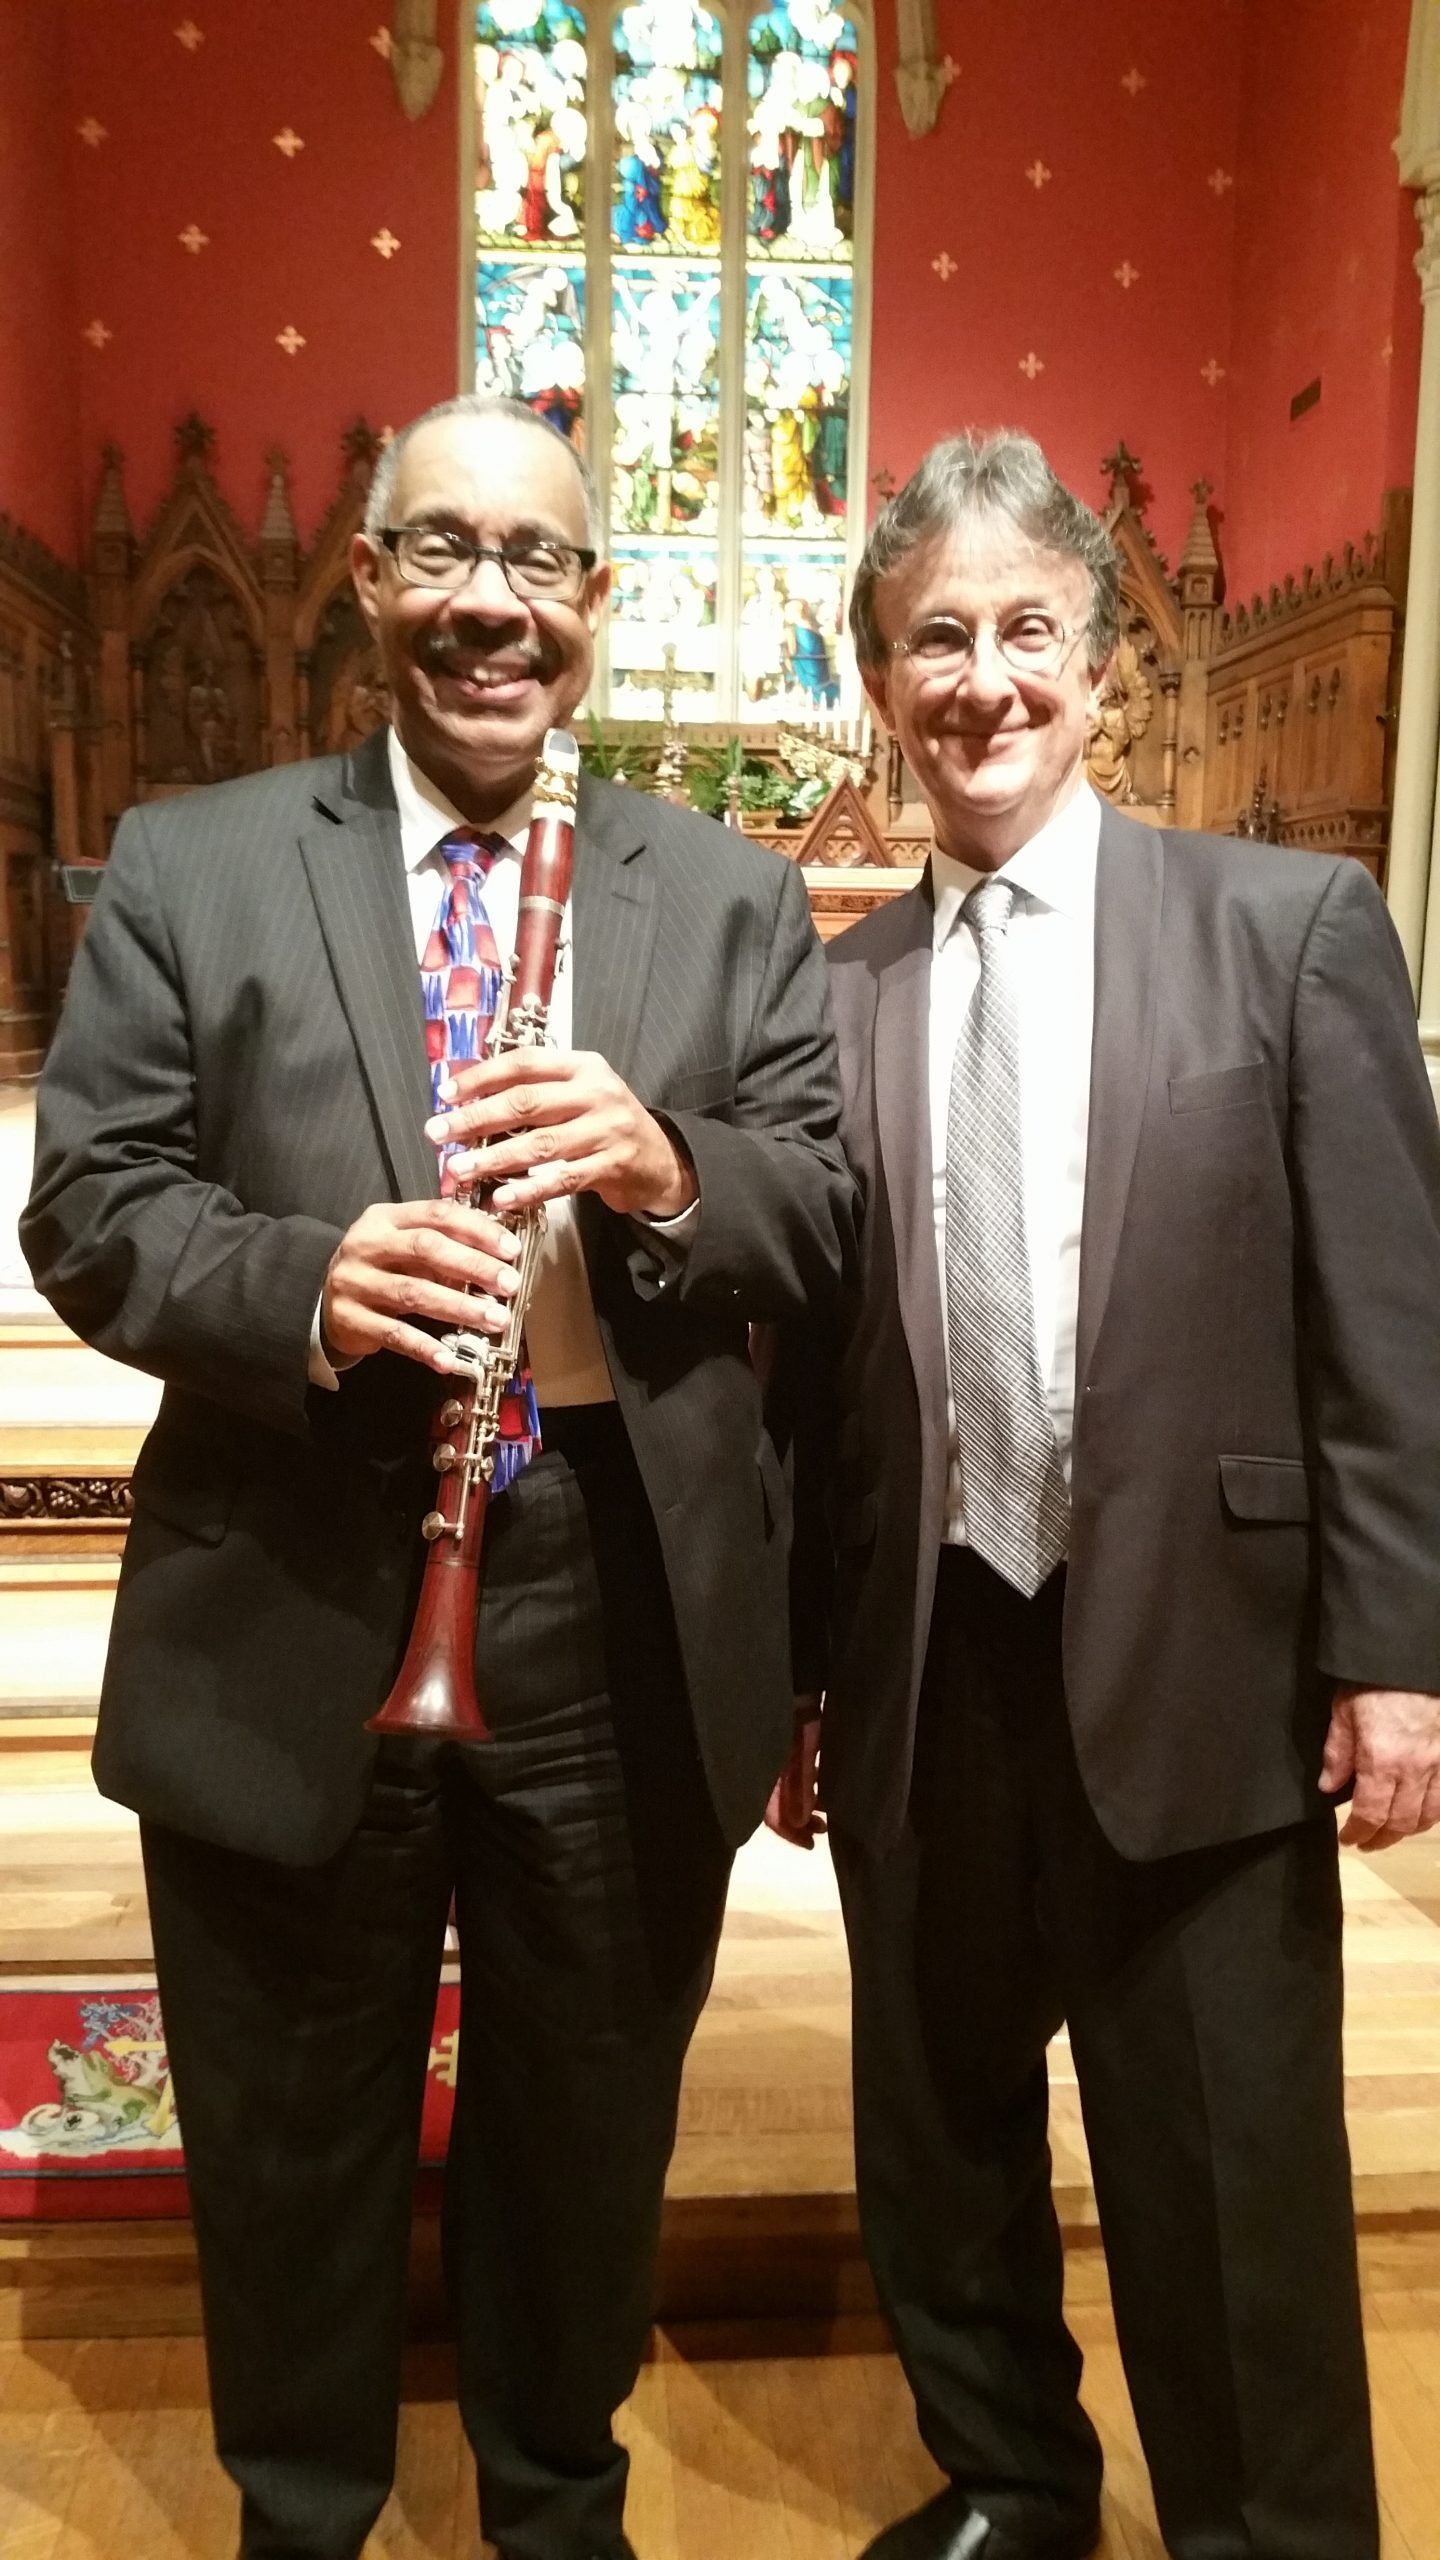 Dr. Michael White and Steve Pistorius